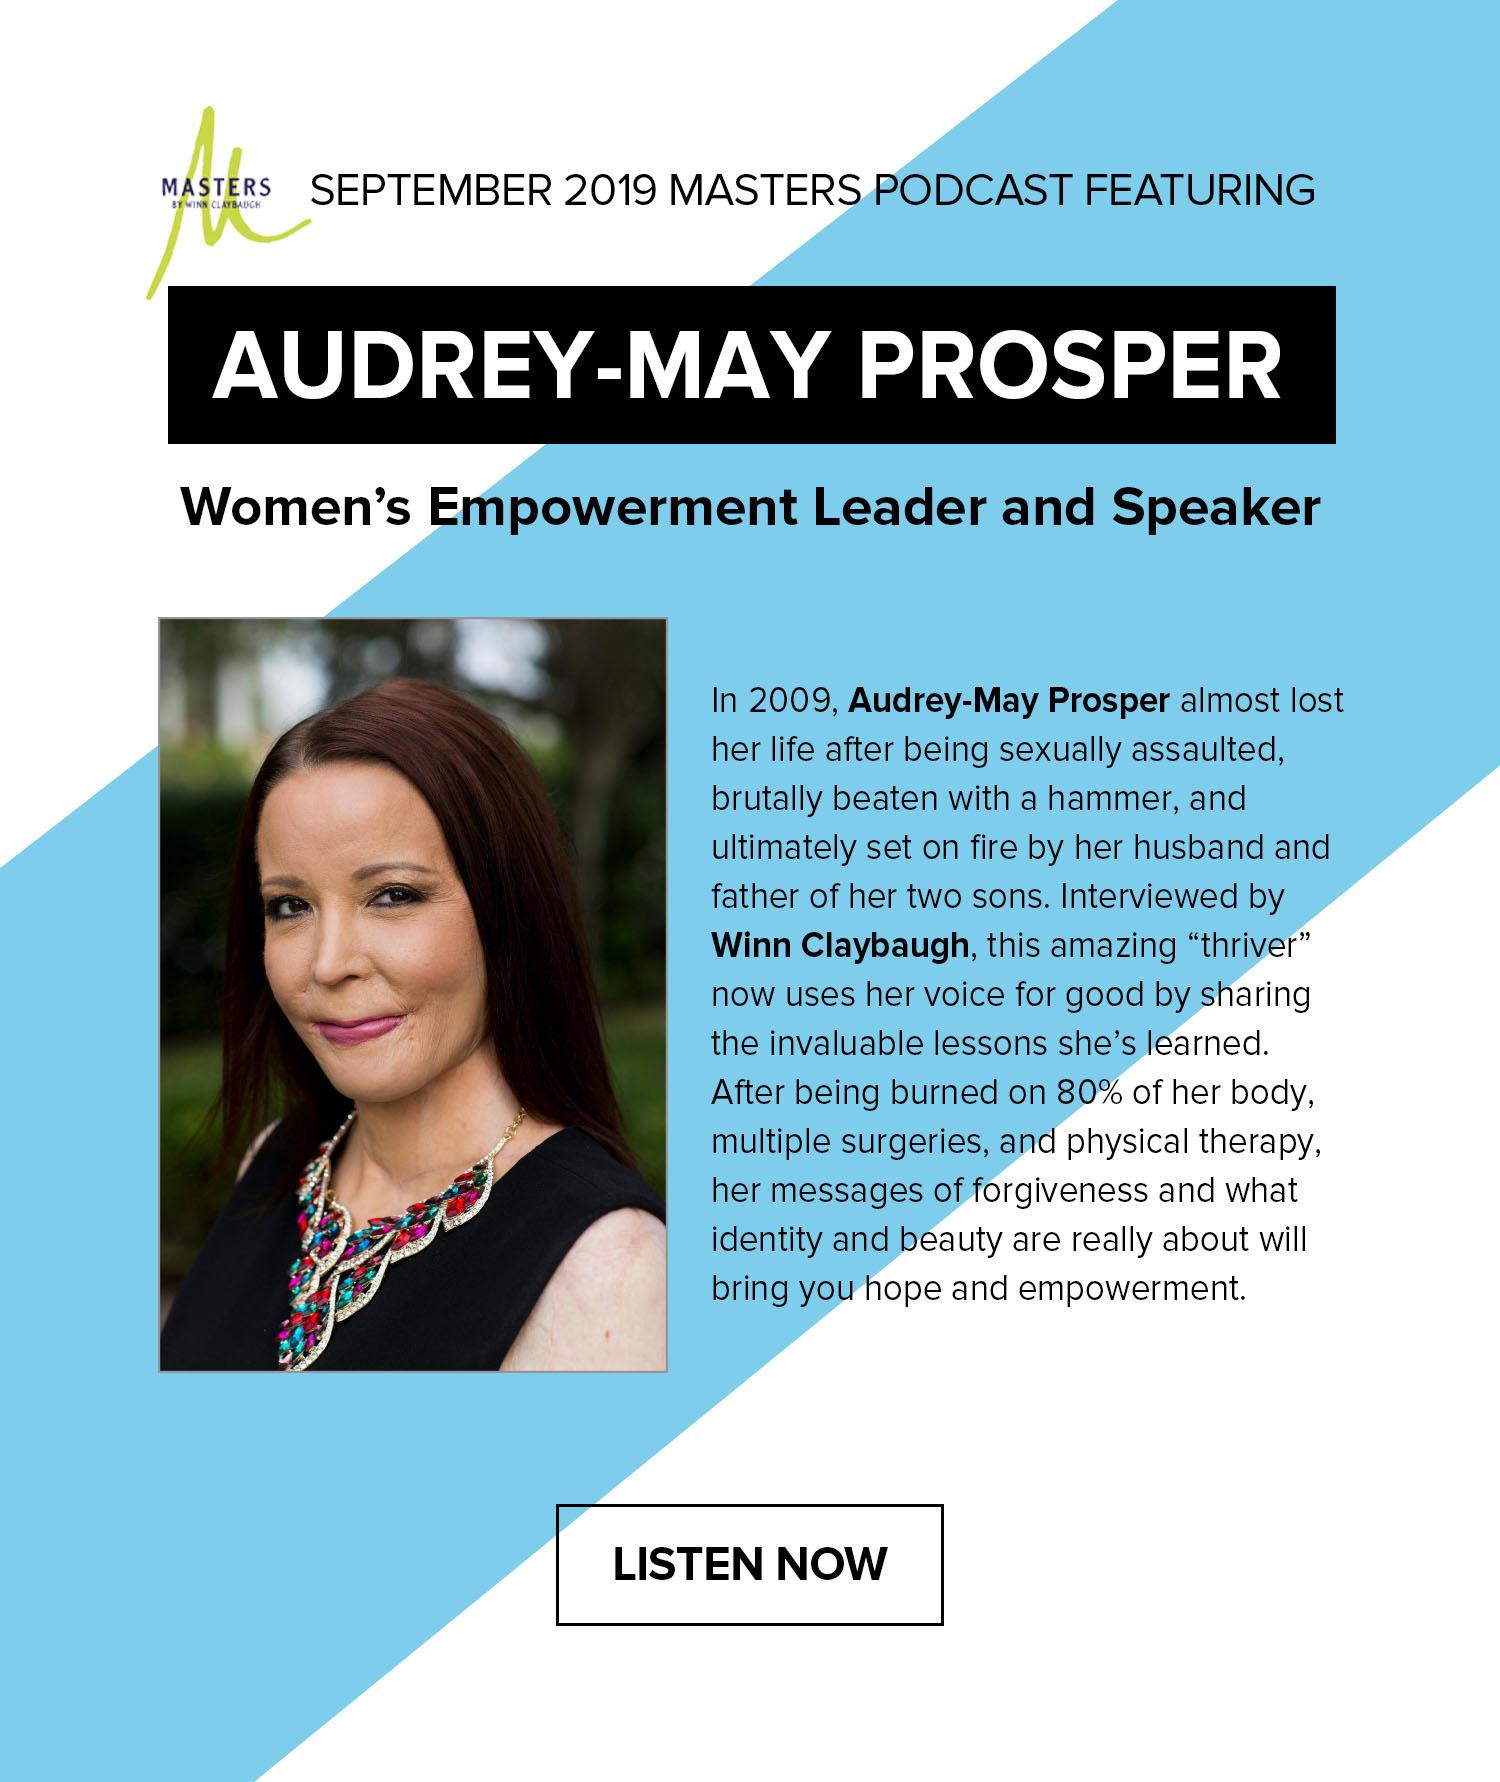 MASTERS Audrey-May Prosper_919.jpg